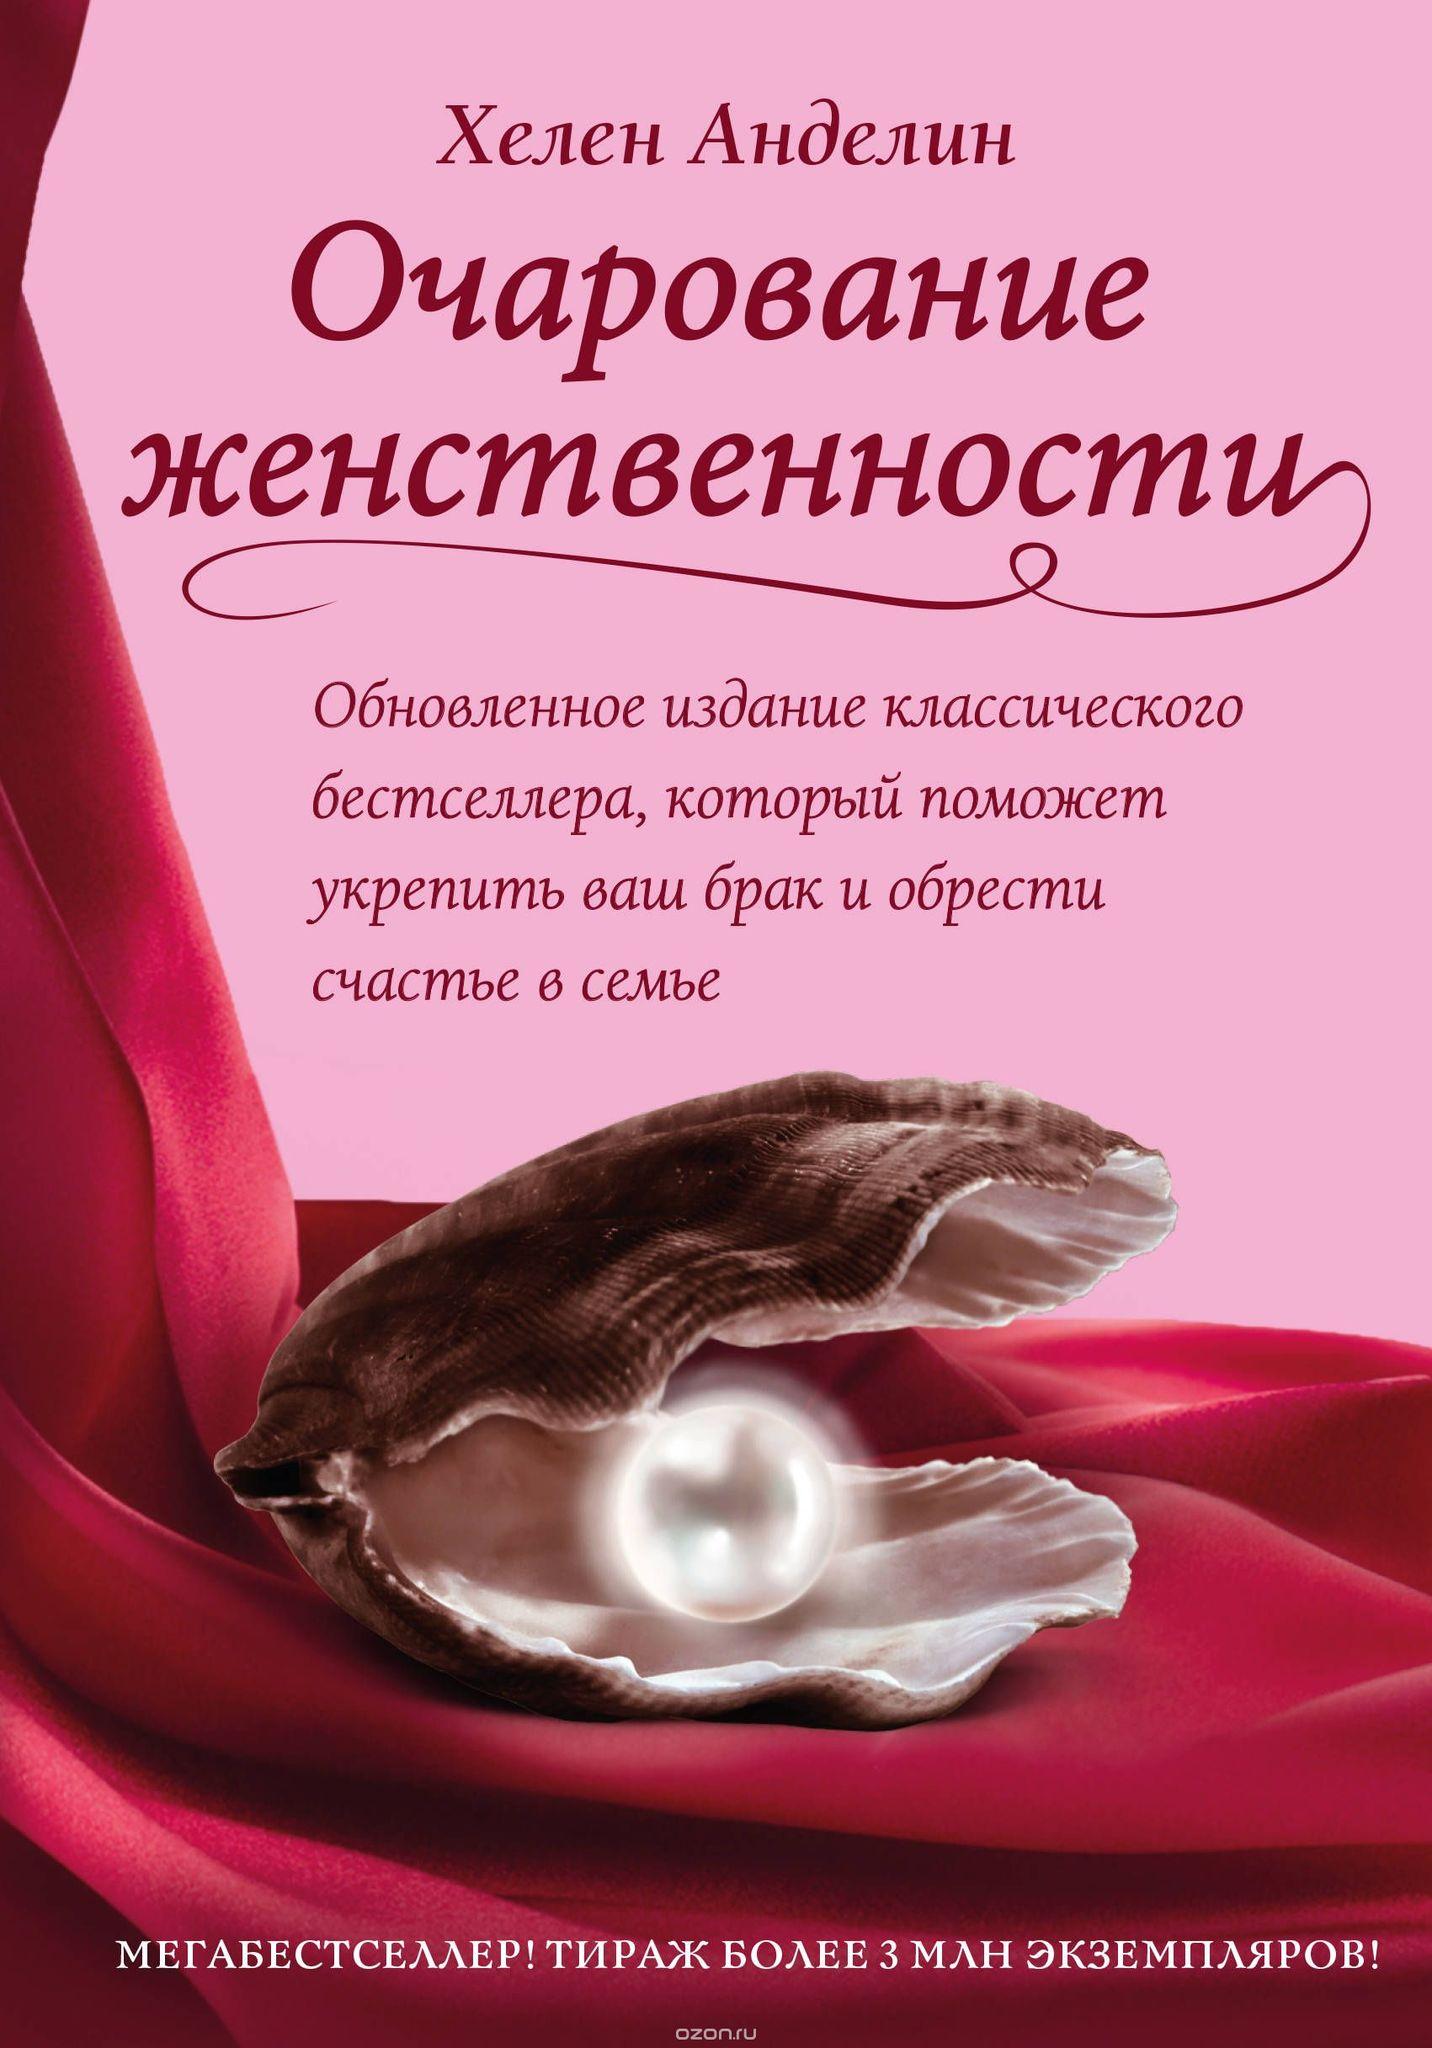 Kitab Очарование женственности   Хелен Анделин